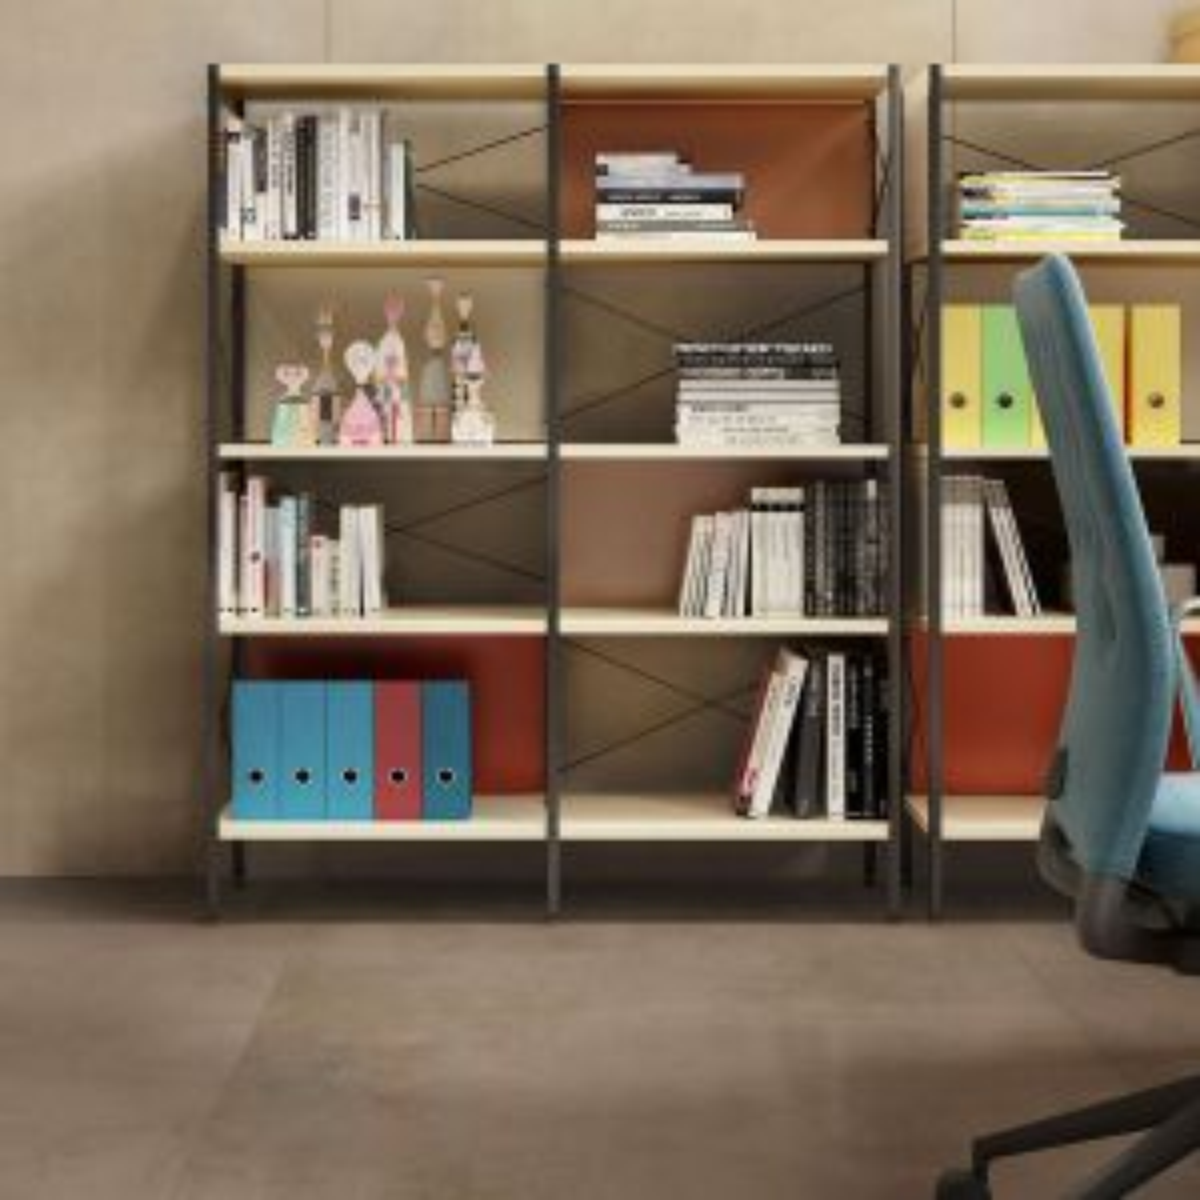 RAK Surface Mid Grey Matt Tile 750 x 750mm Lifestyle